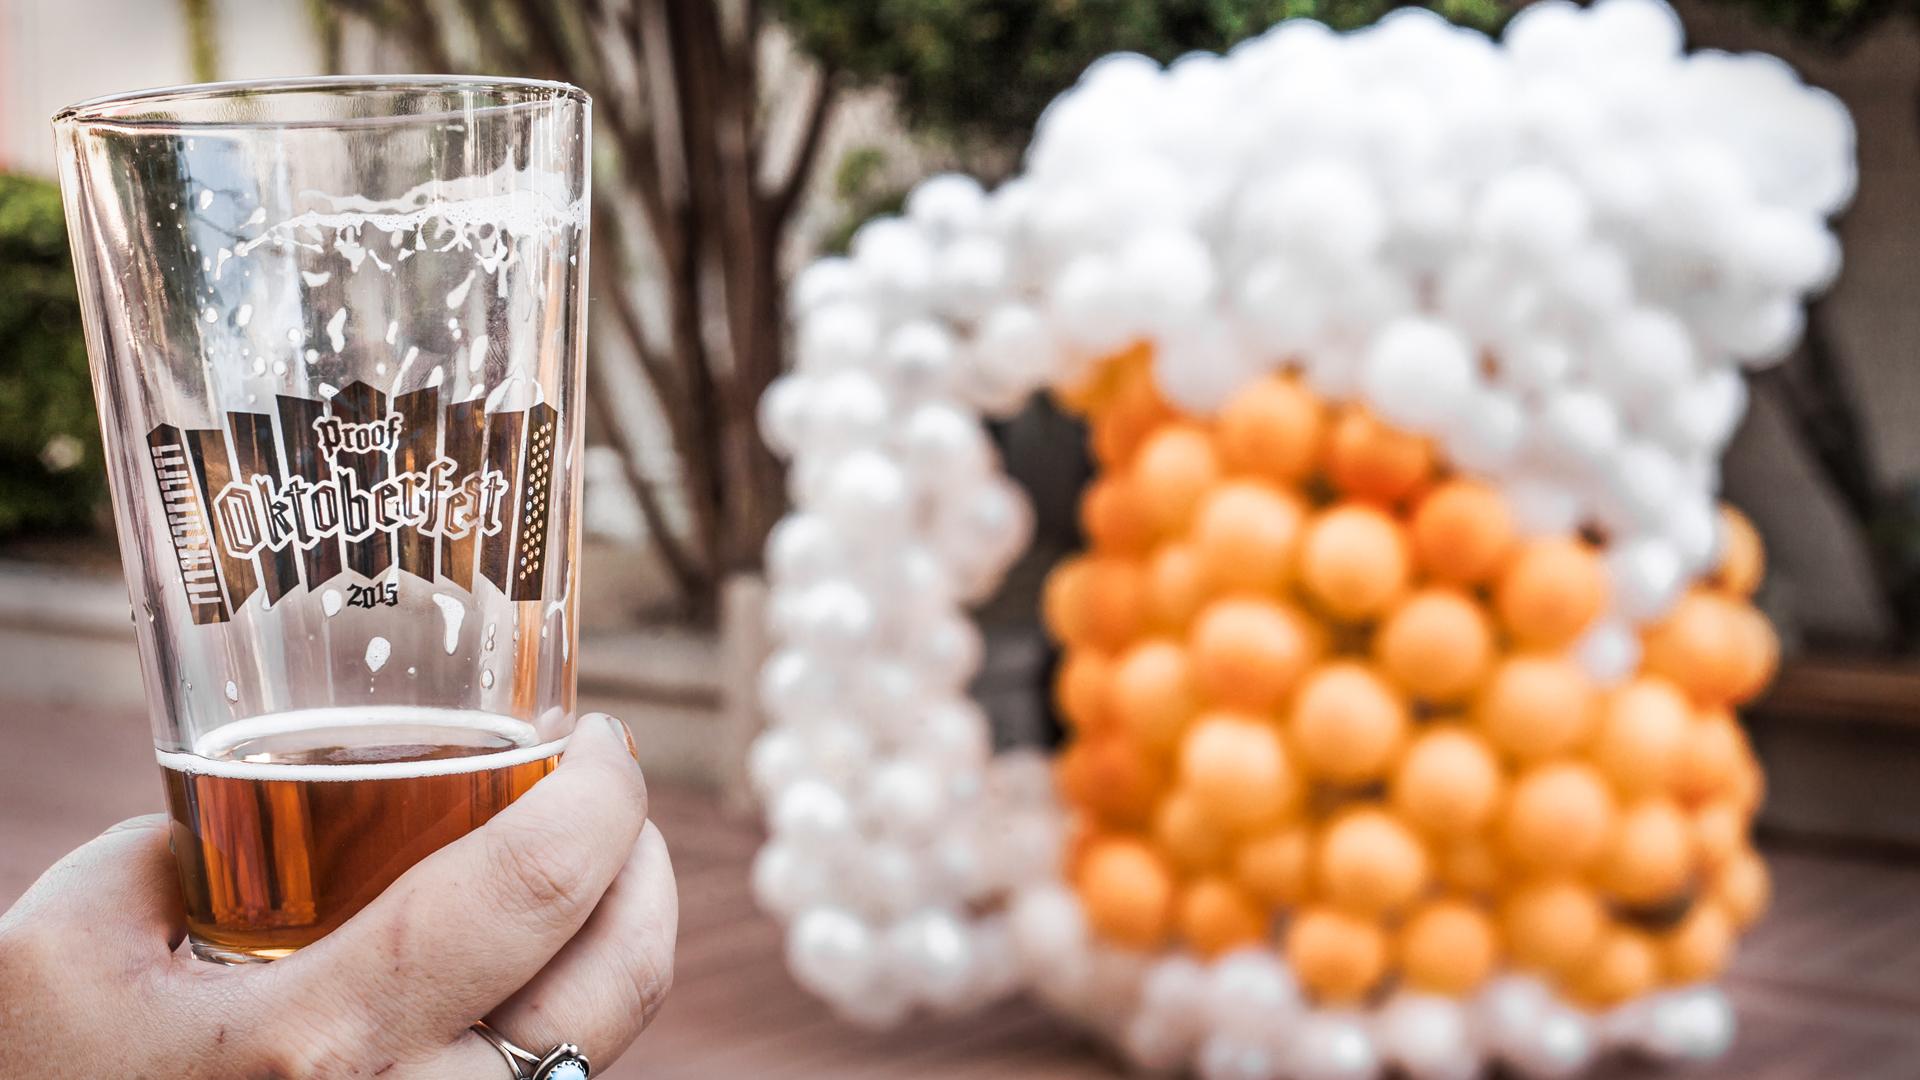 Proof Oktoberfest Accordion  Pint Glass  & Mug  Balloon Sculpture